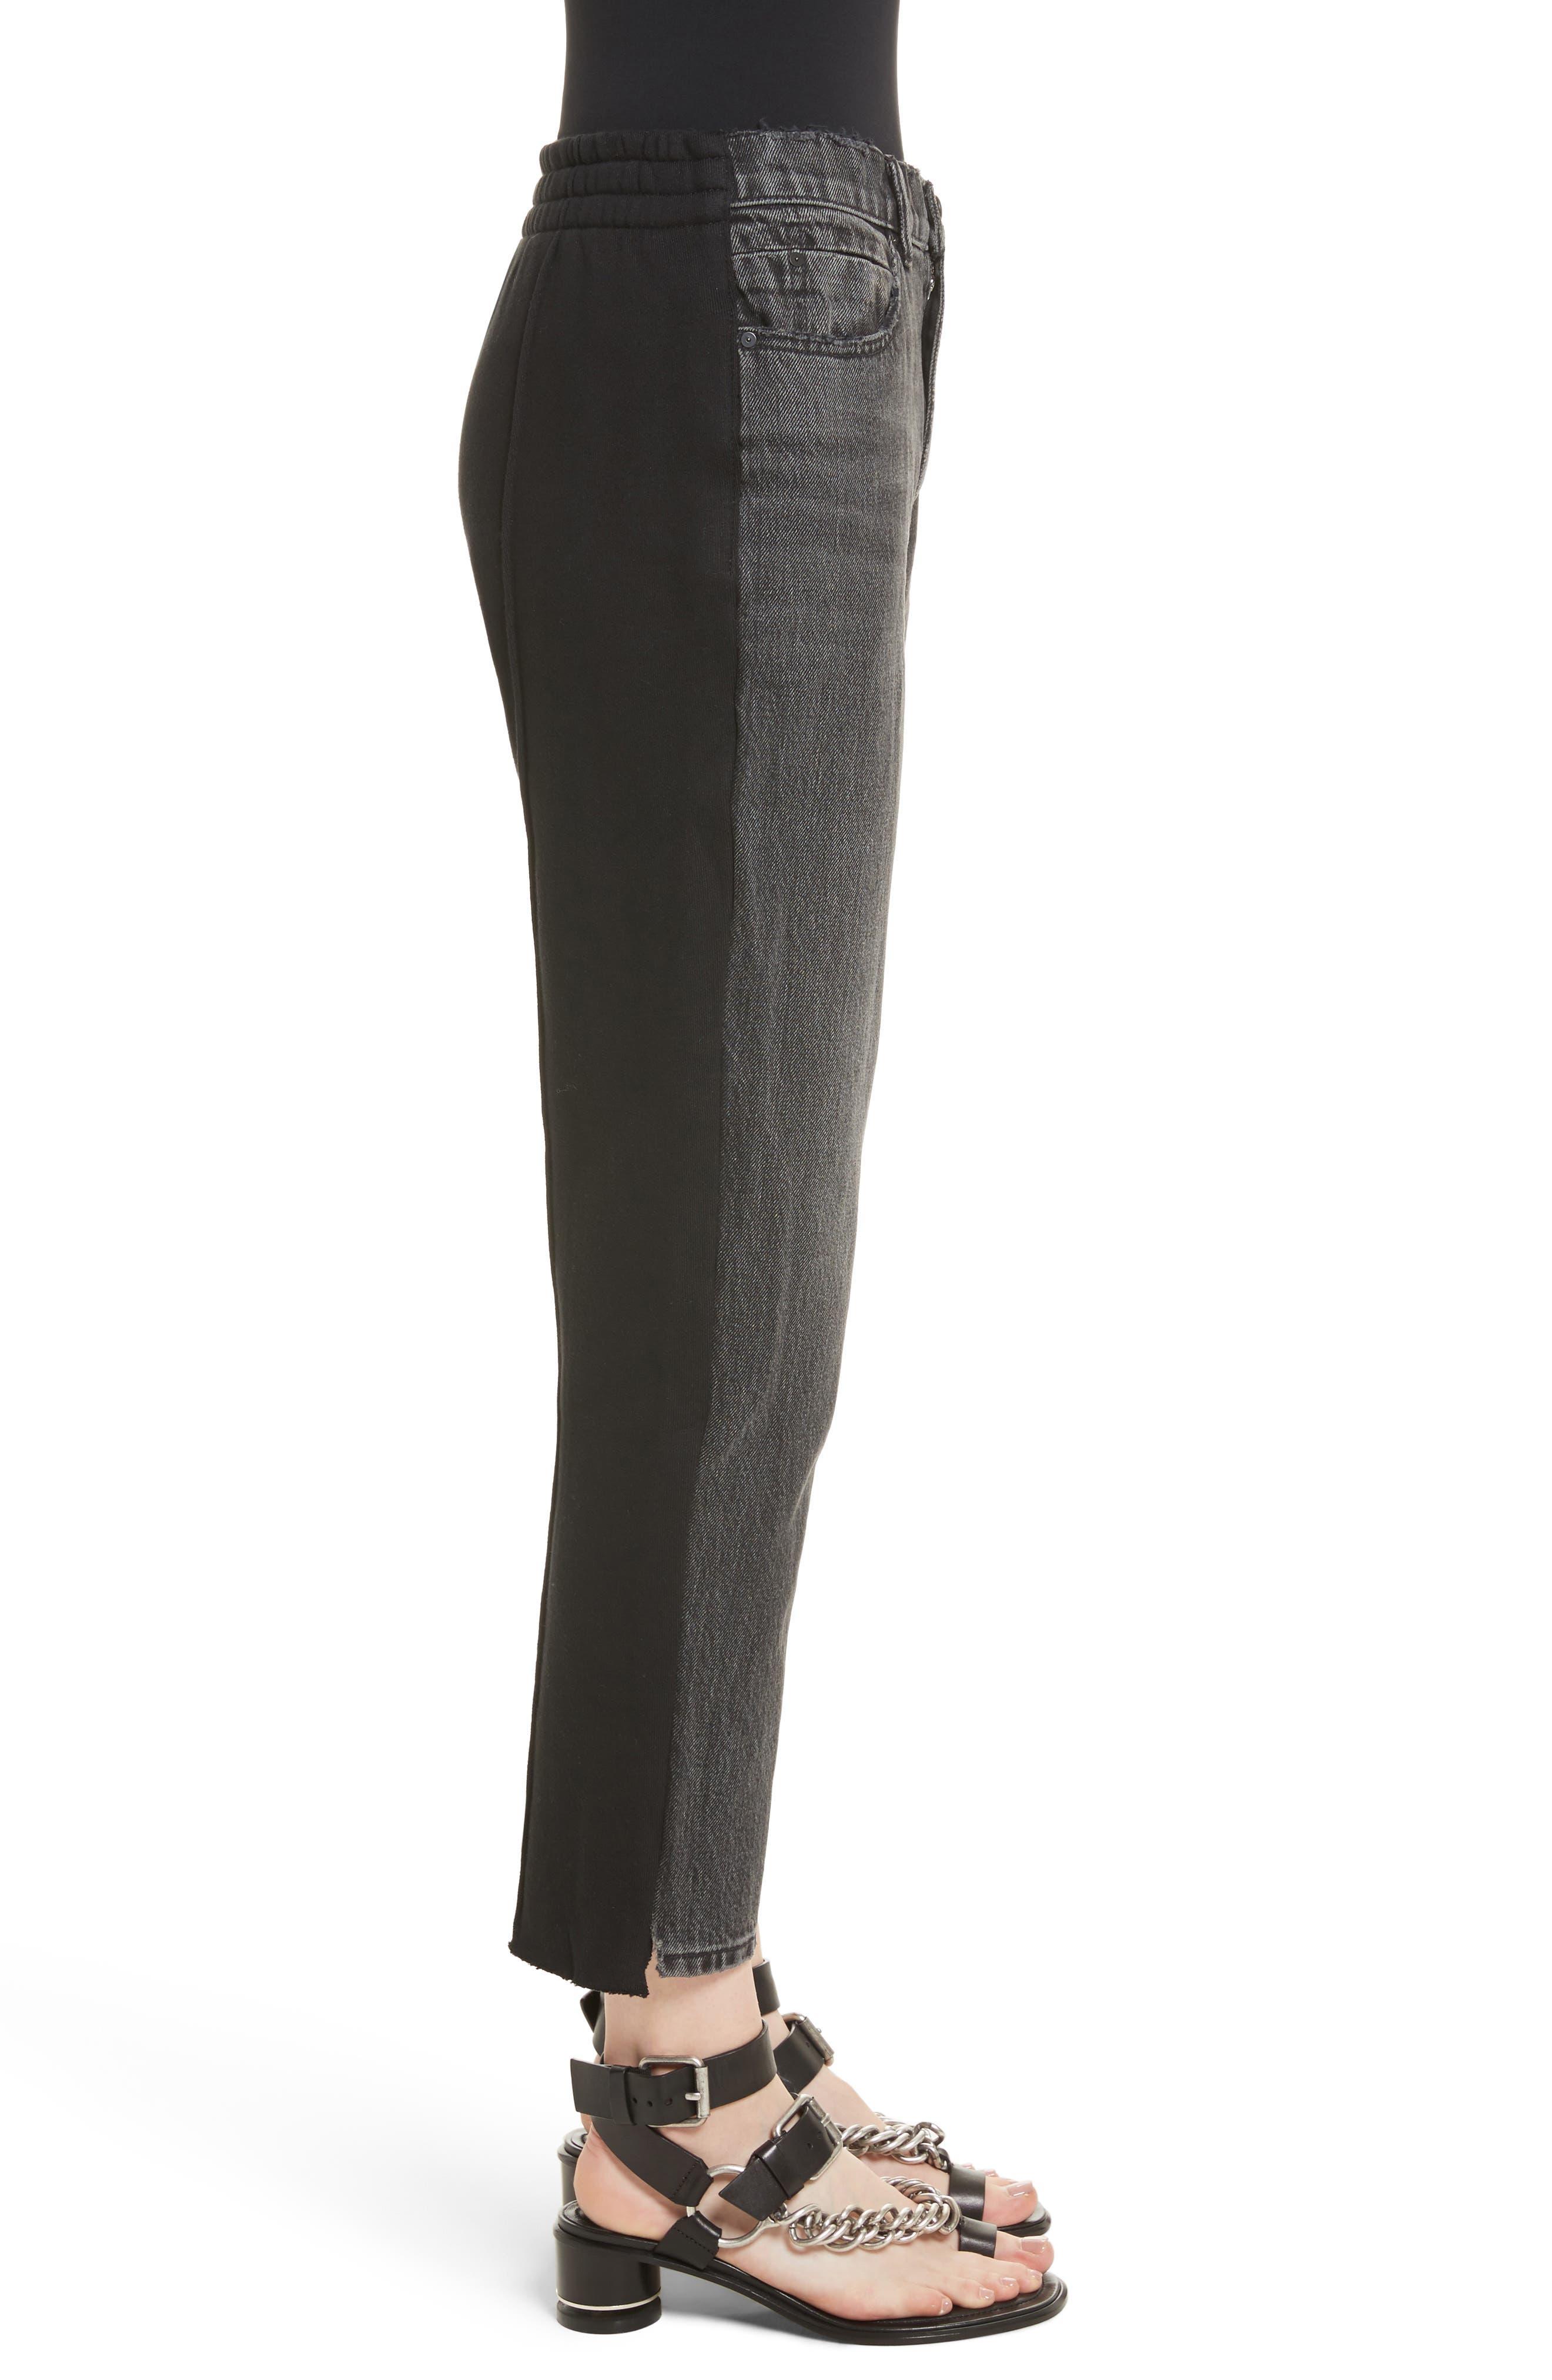 Denim x Alexander Wang Hybrid Sweatpants Jeans,                             Alternate thumbnail 3, color,                             025